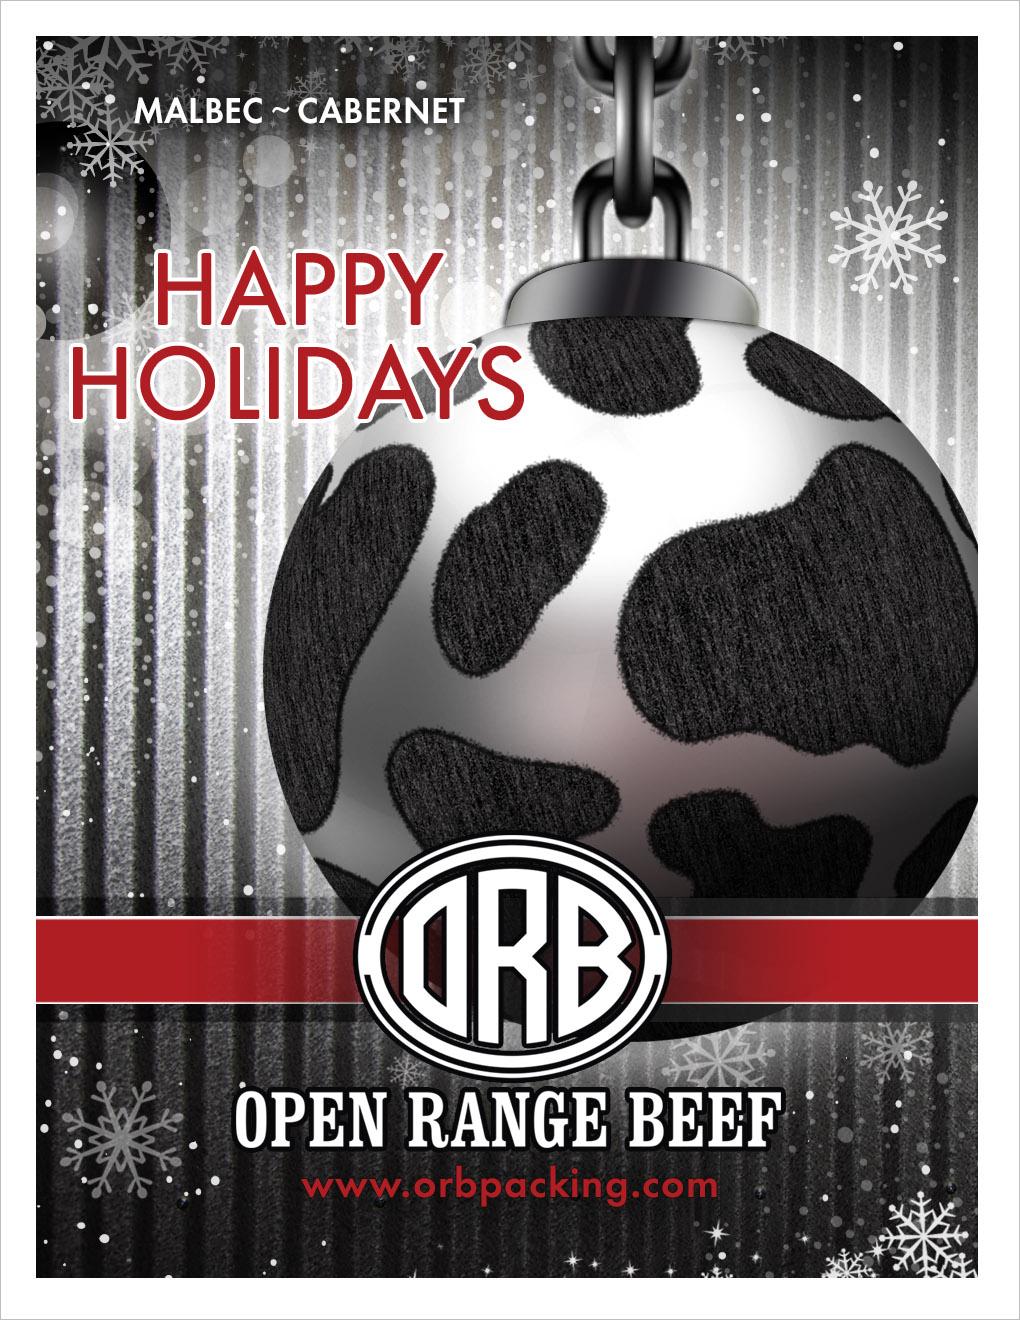 Open Range Beef Wine Label Gordon, NE